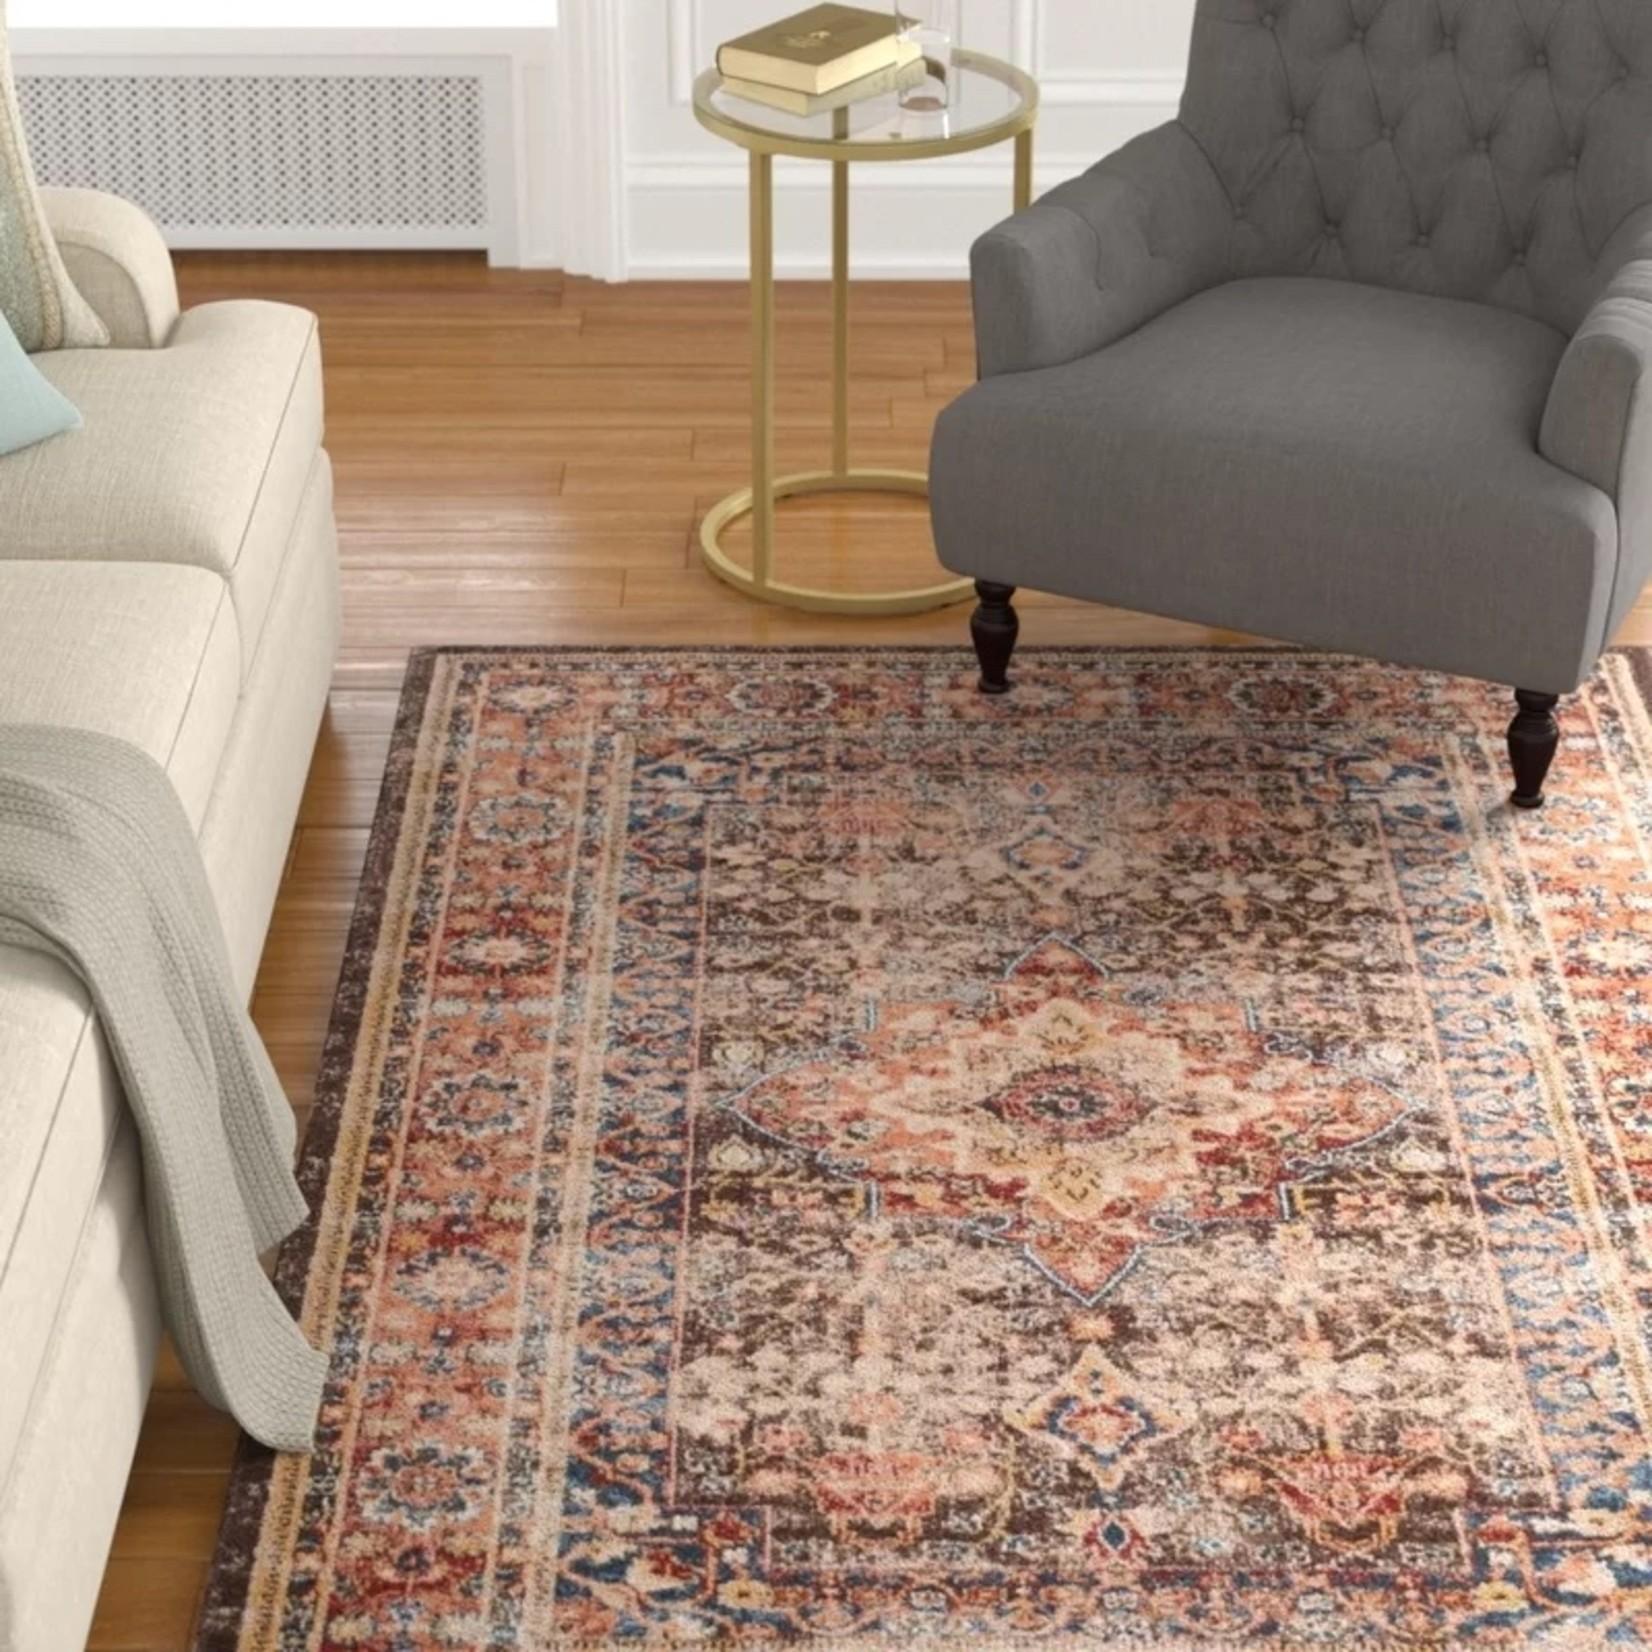 *5'3 x 7'6 - Broomhedge Oriental Brown Area Rug